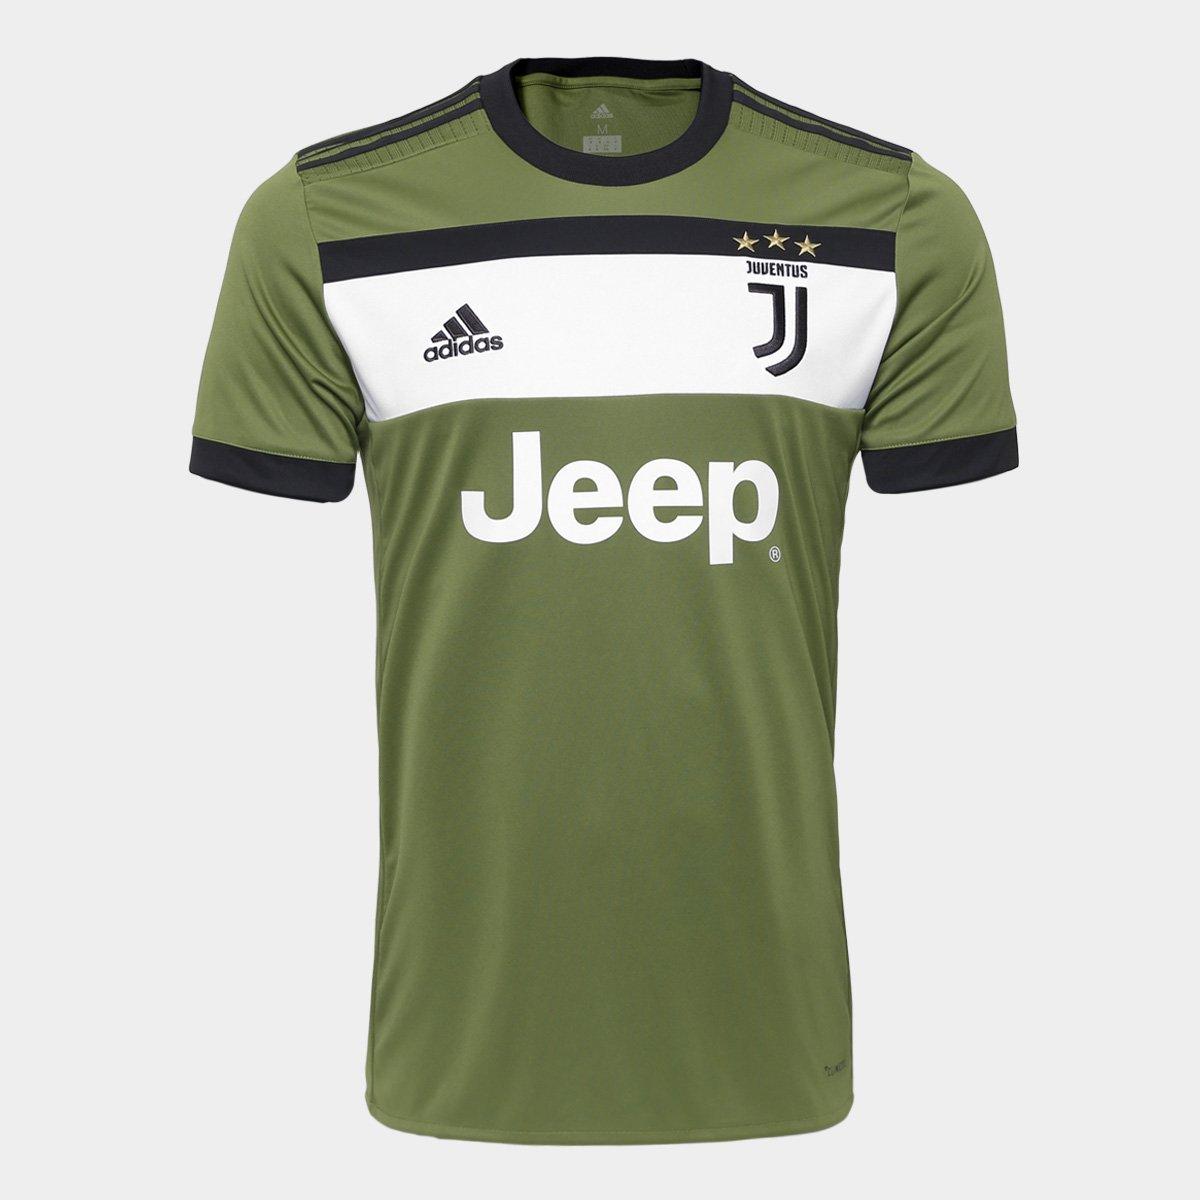 camisa juventus third 17 18 s n torcedor adidas masculina netshoes camisa juventus third 17 18 s n torcedor adidas masculina